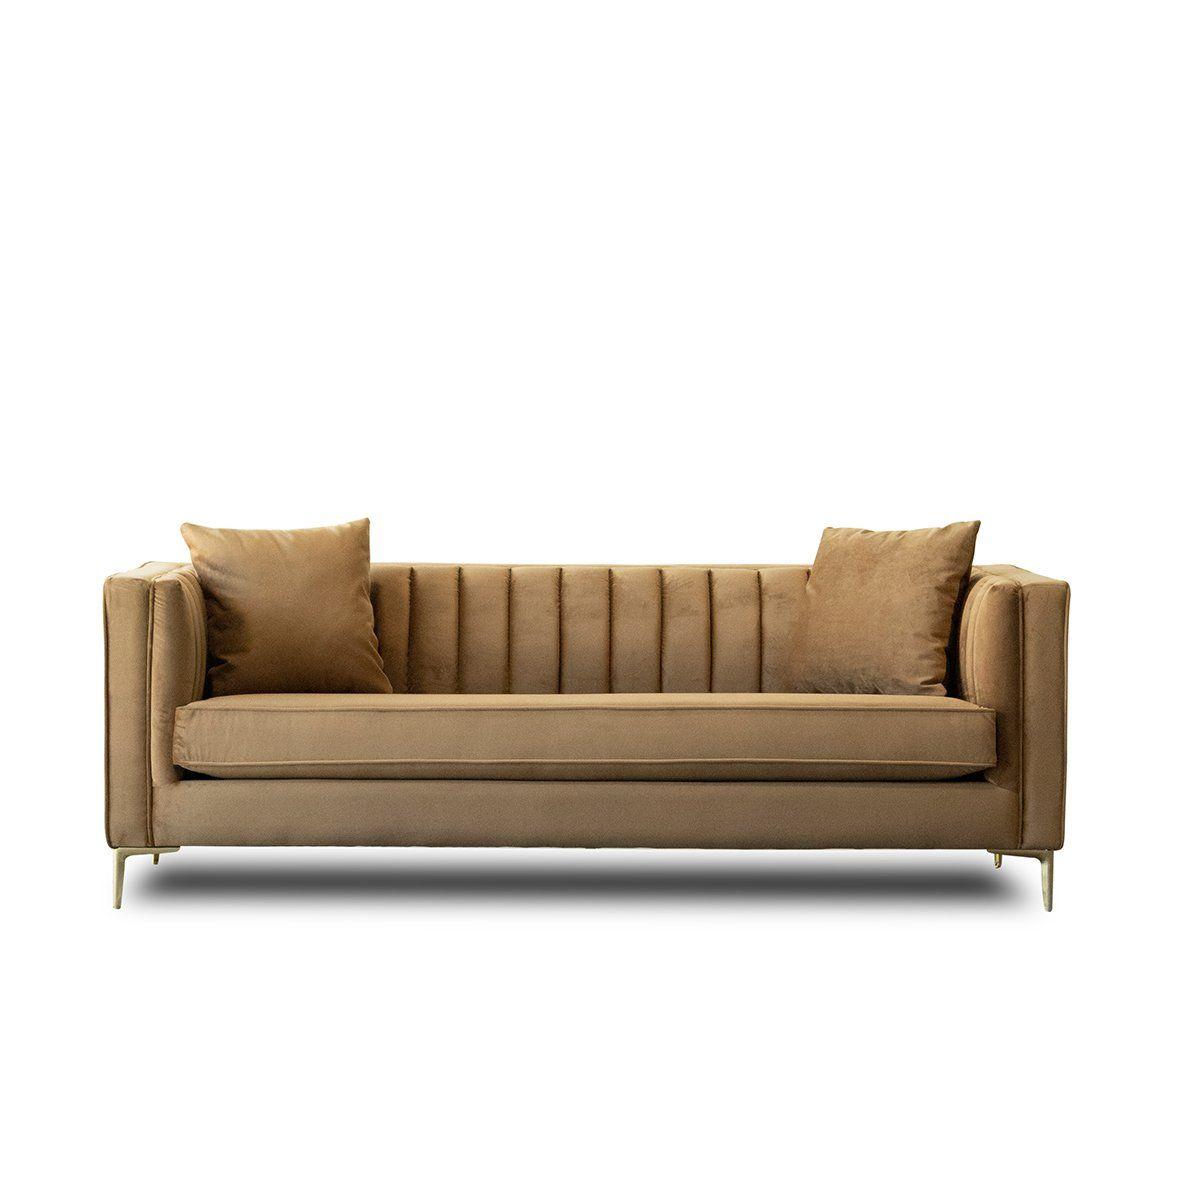 Kendra Sofa In Cognac Sofa Modern Sofa Mid Century Modern Sofa